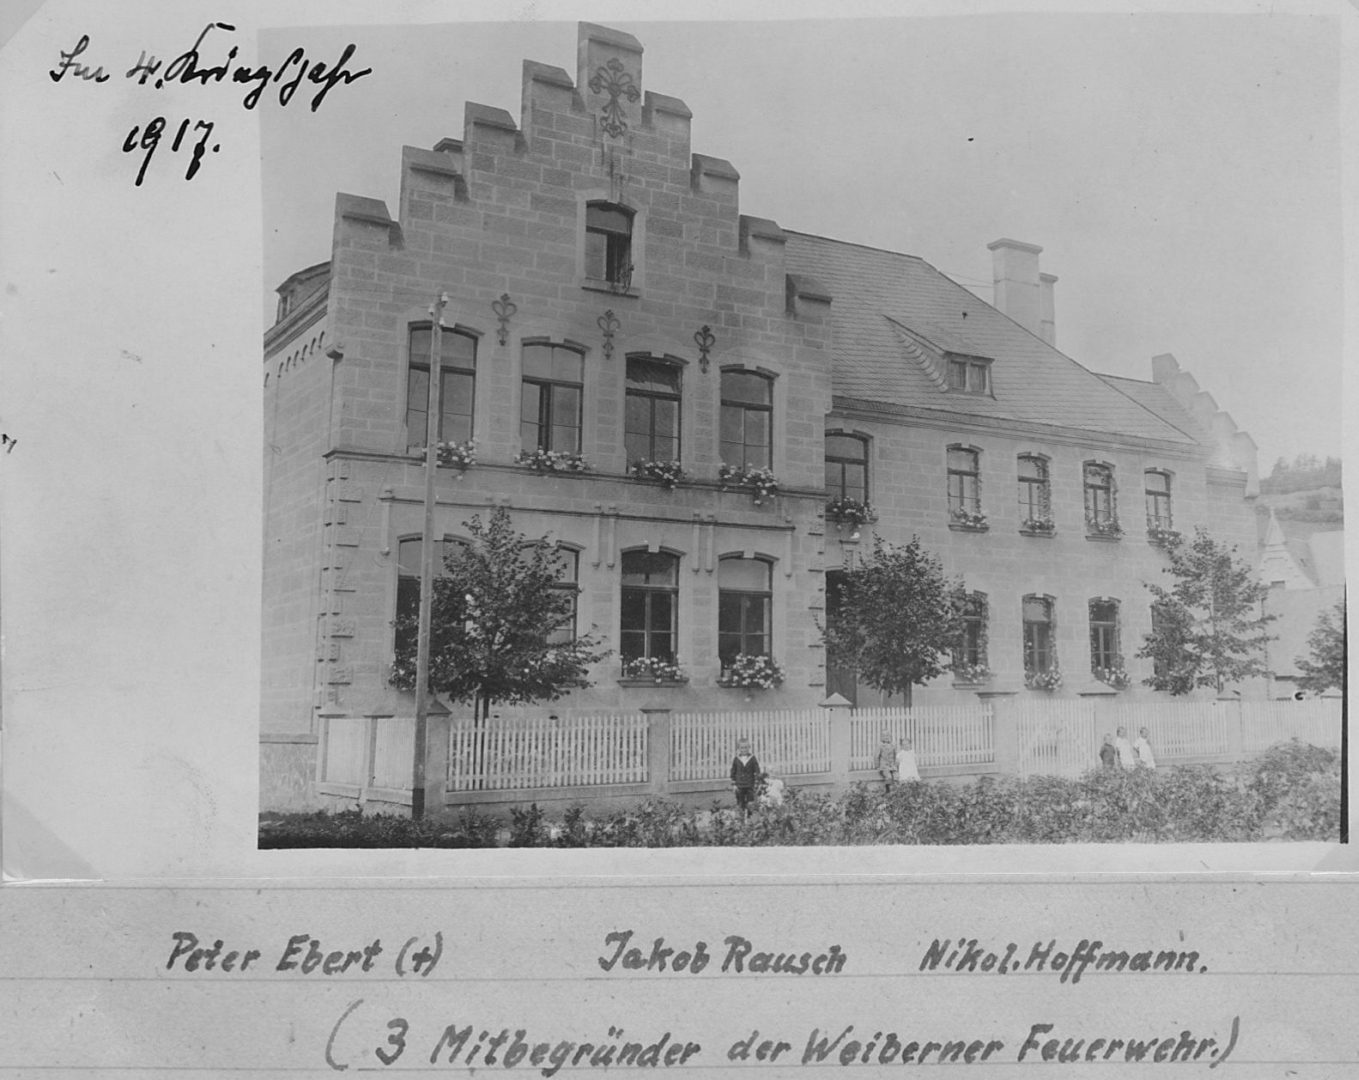 Schulchronik-1917-Bild-1